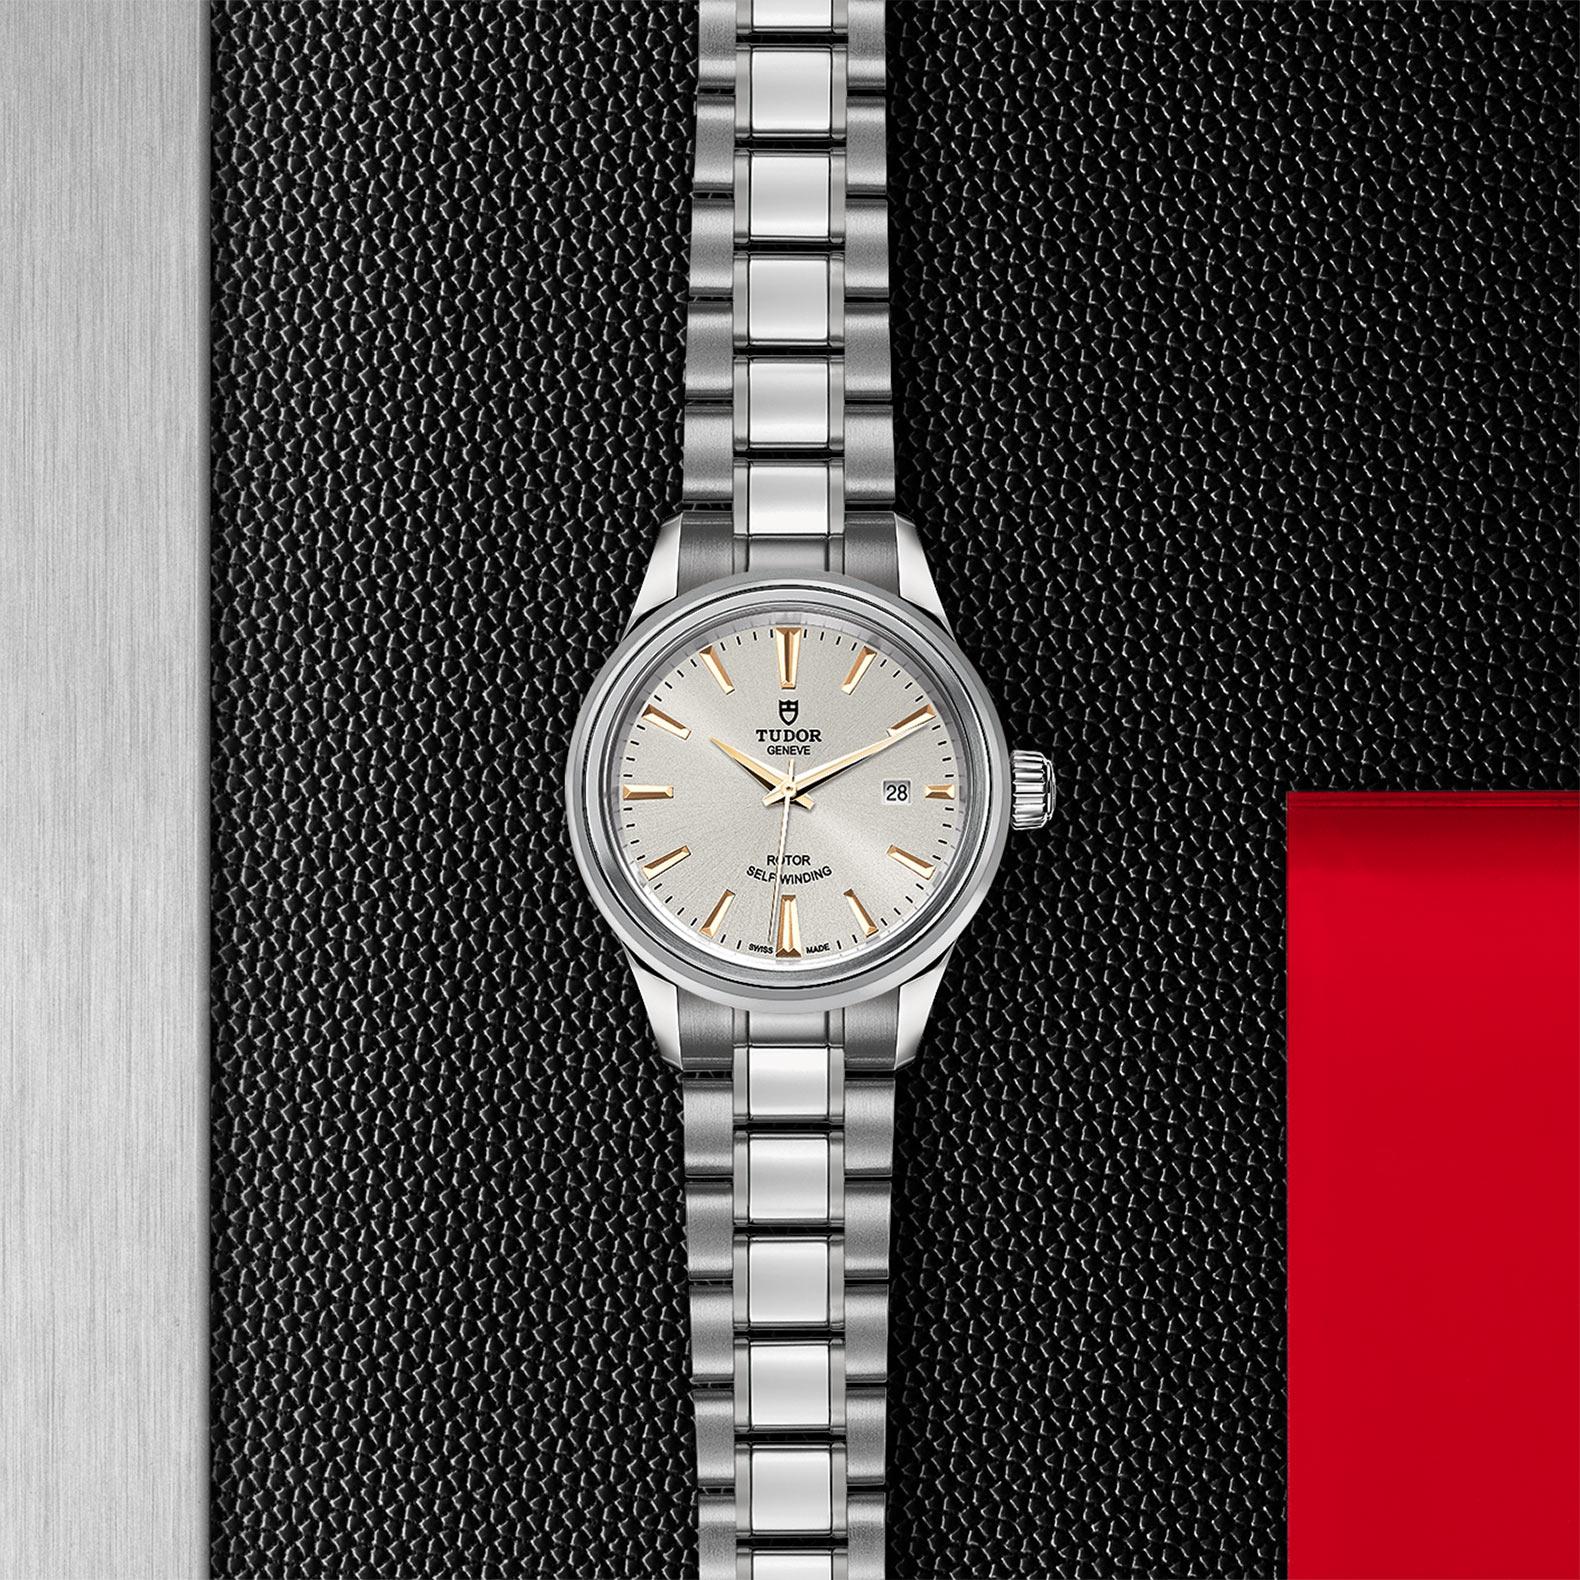 TUDOR Style - M12100-0017